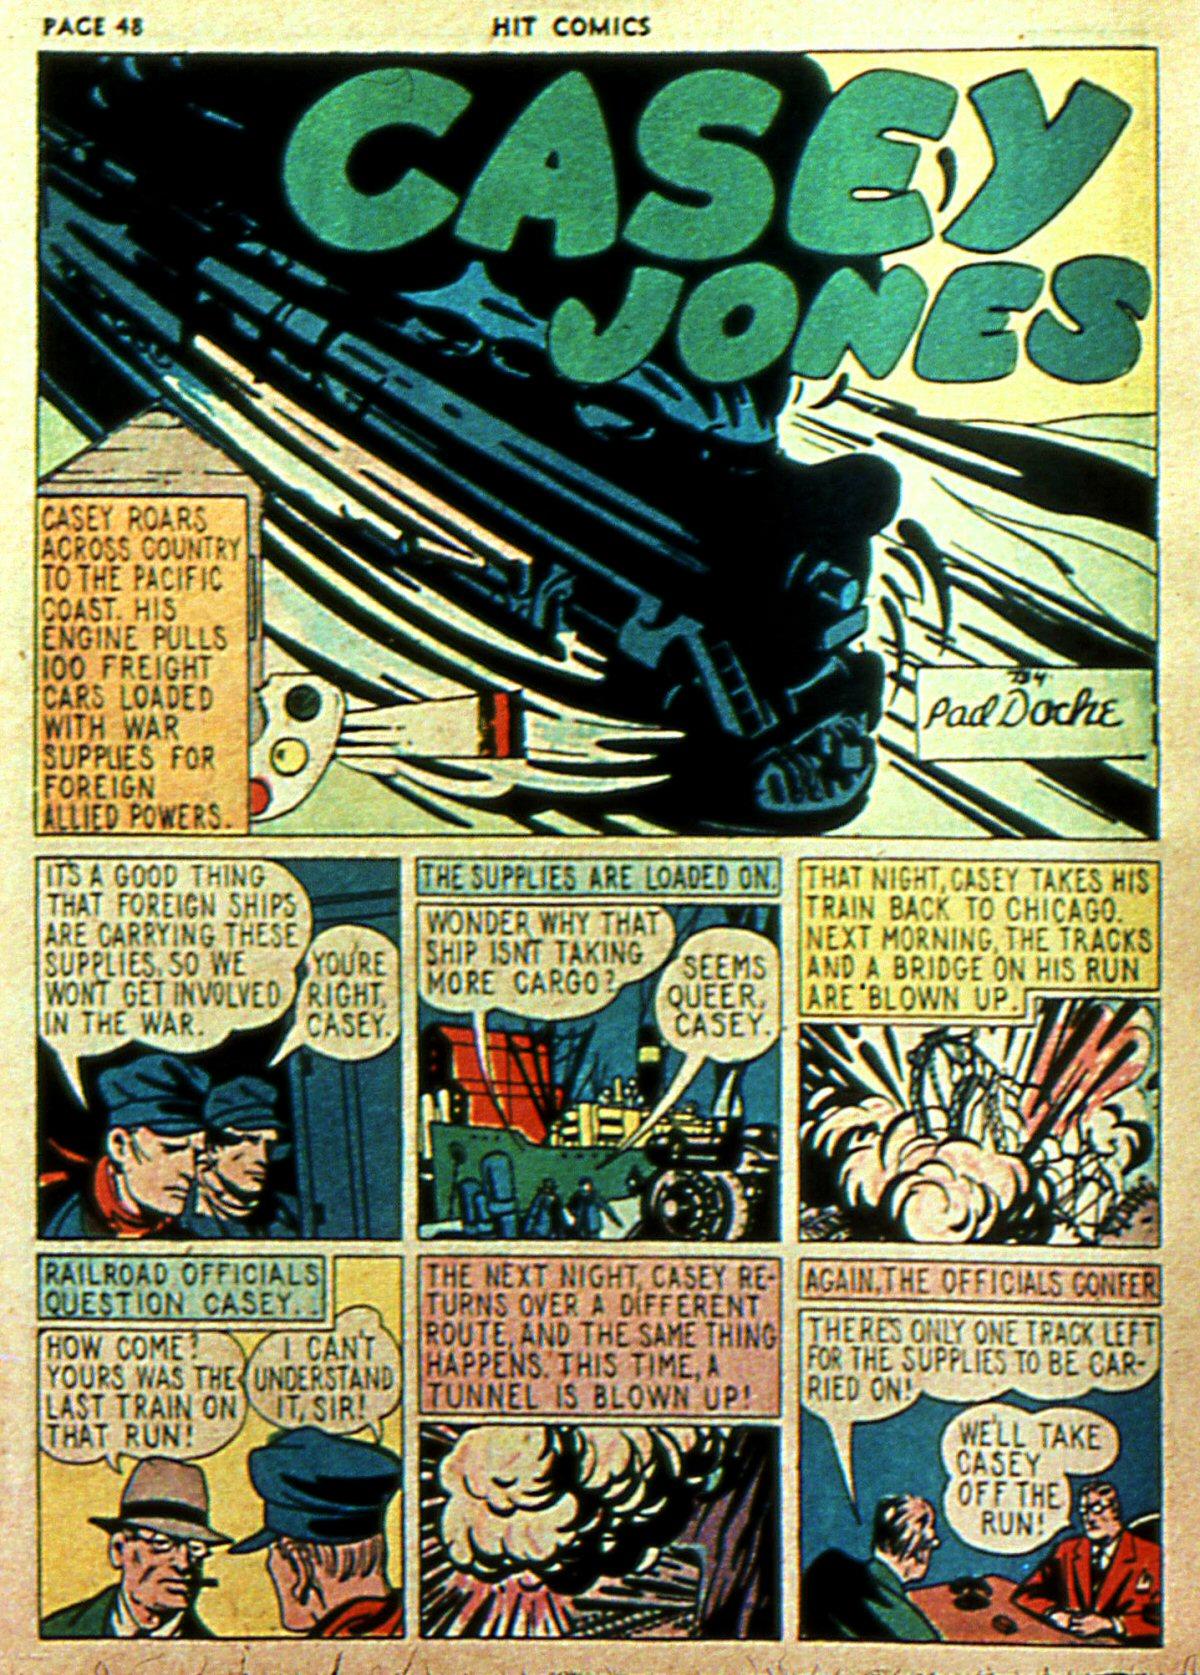 Read online Hit Comics comic -  Issue #2 - 50